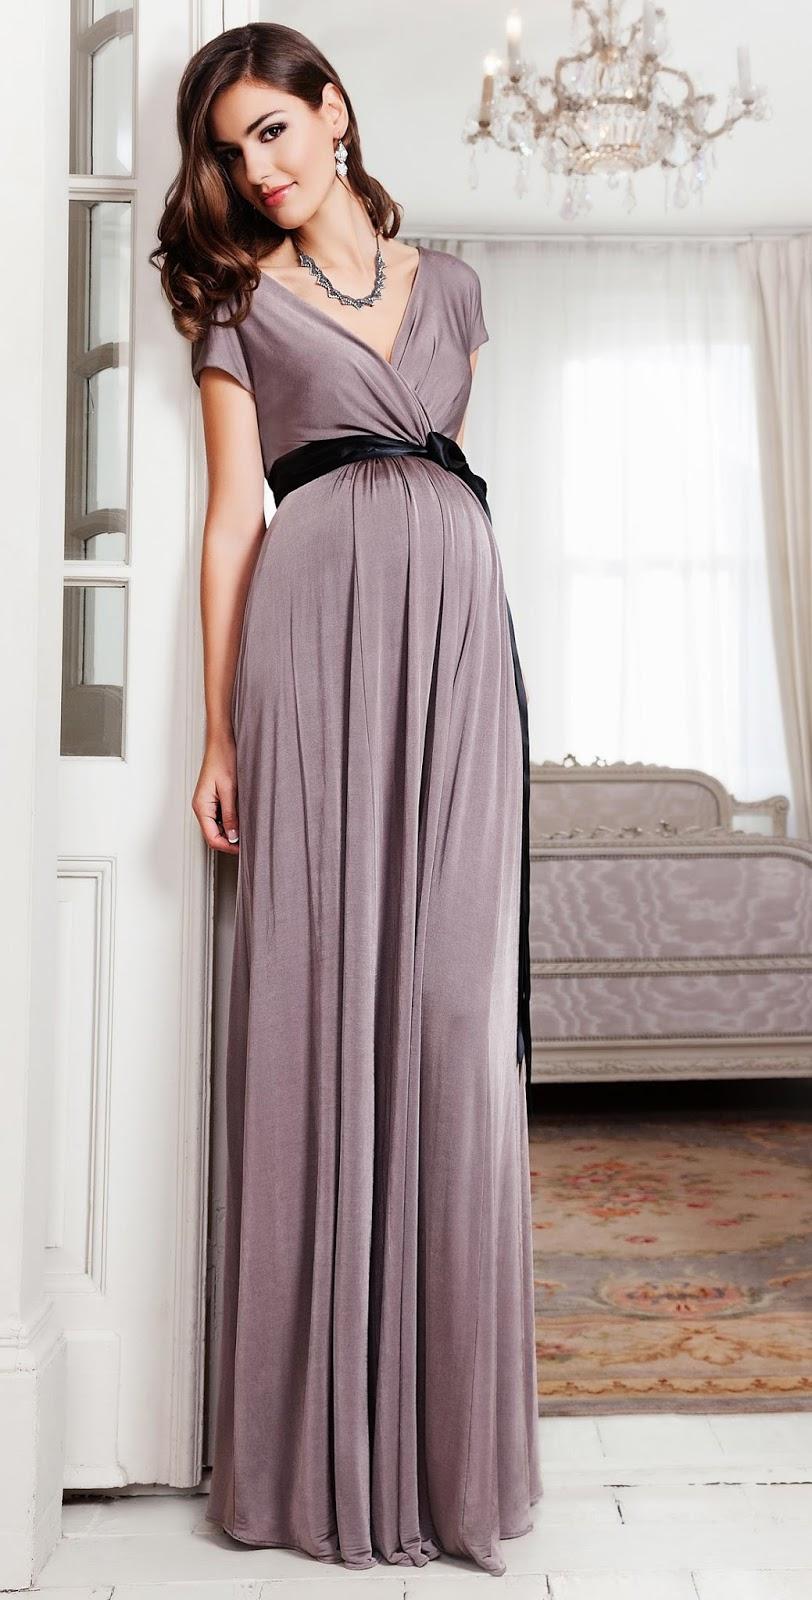 2acfd6a6cd Bladośliwkowa sukienka.. mmm! Available at  Tiffany Rose